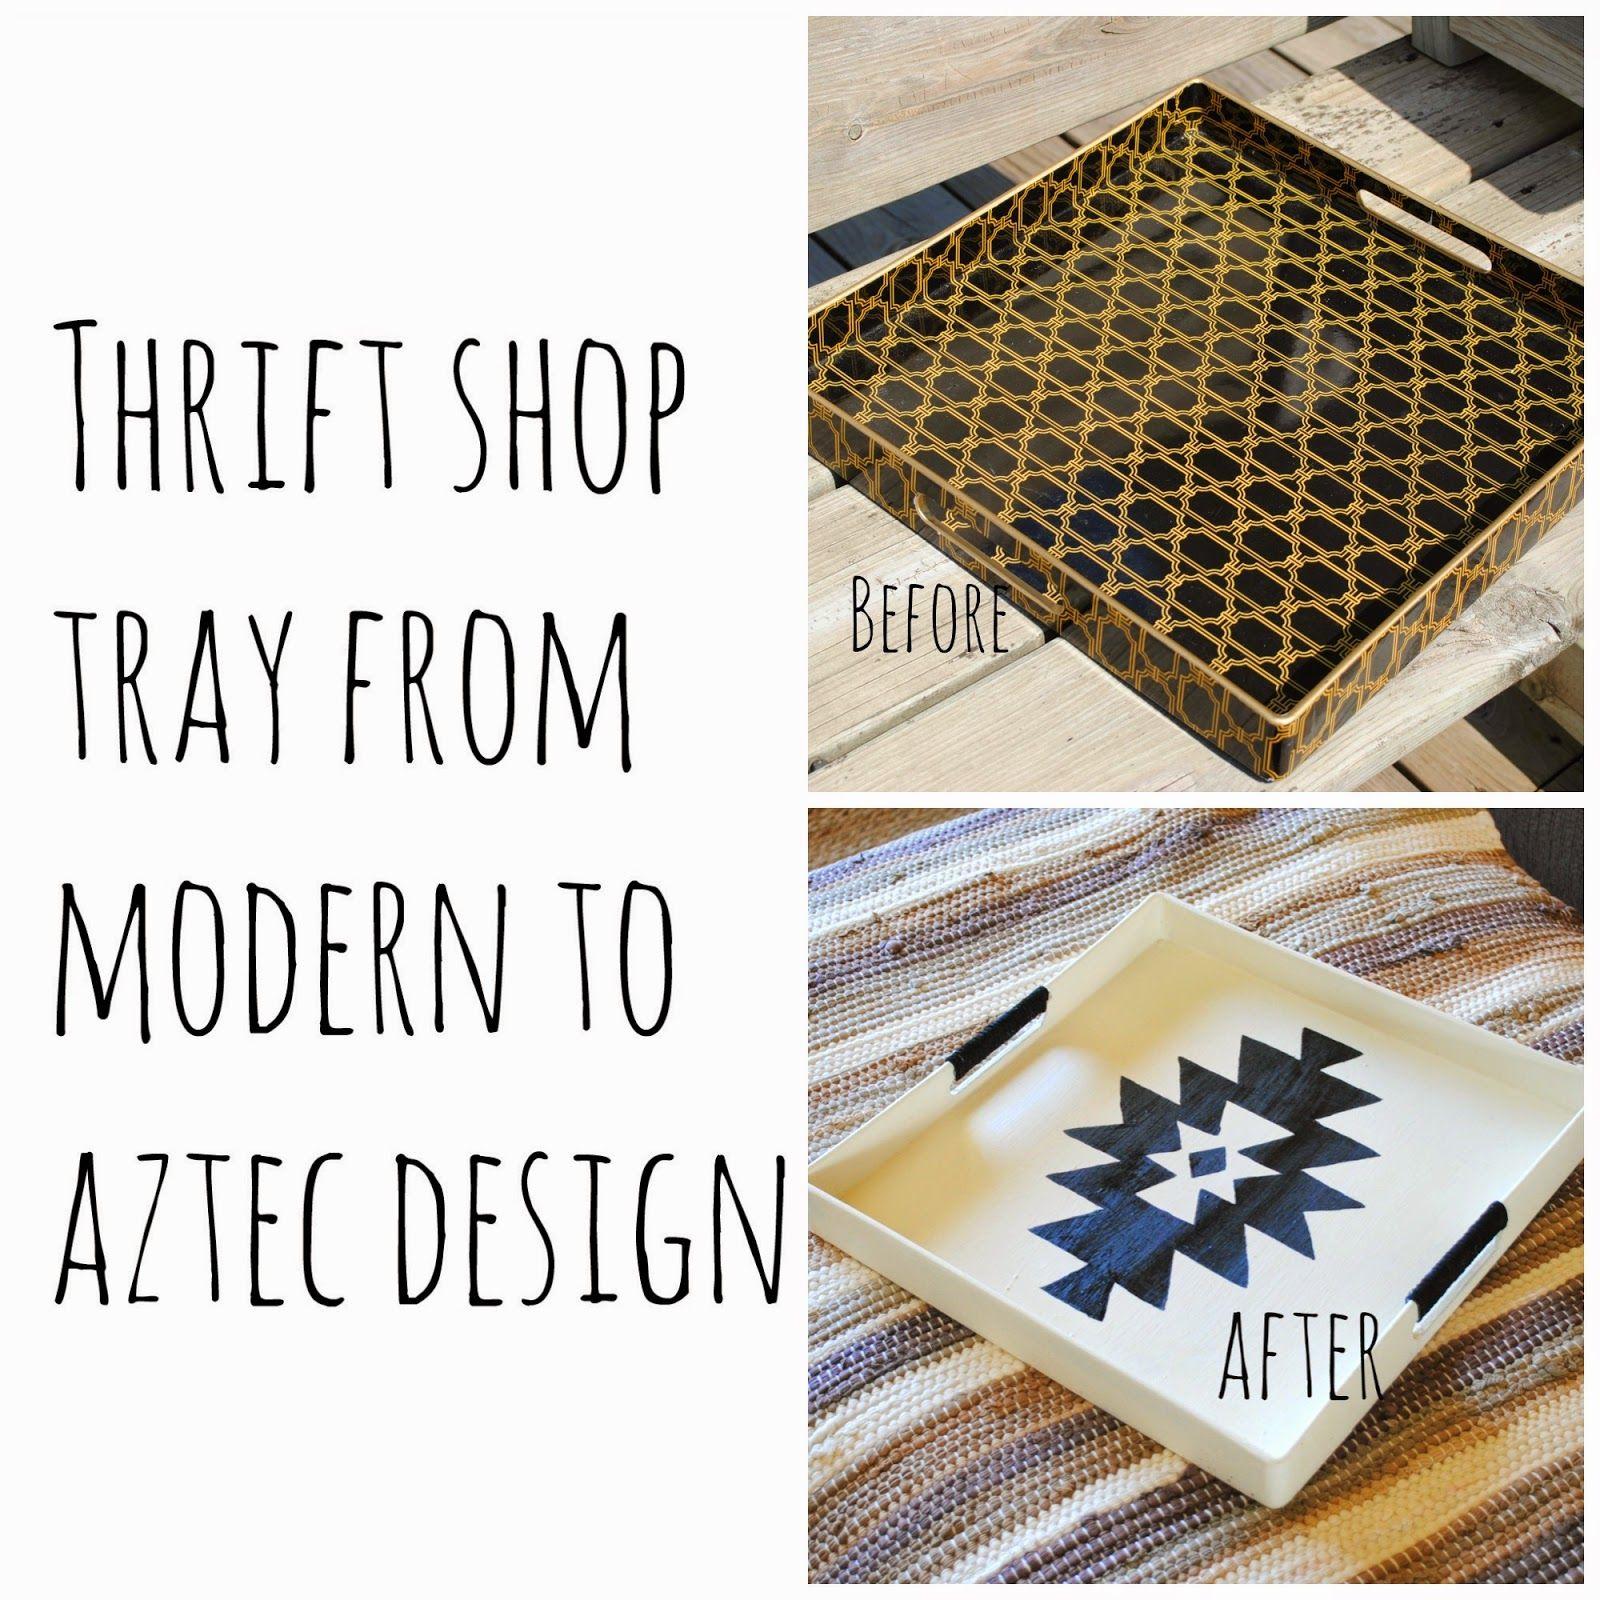 ~Irishman Acres~: A thrift shop re-design